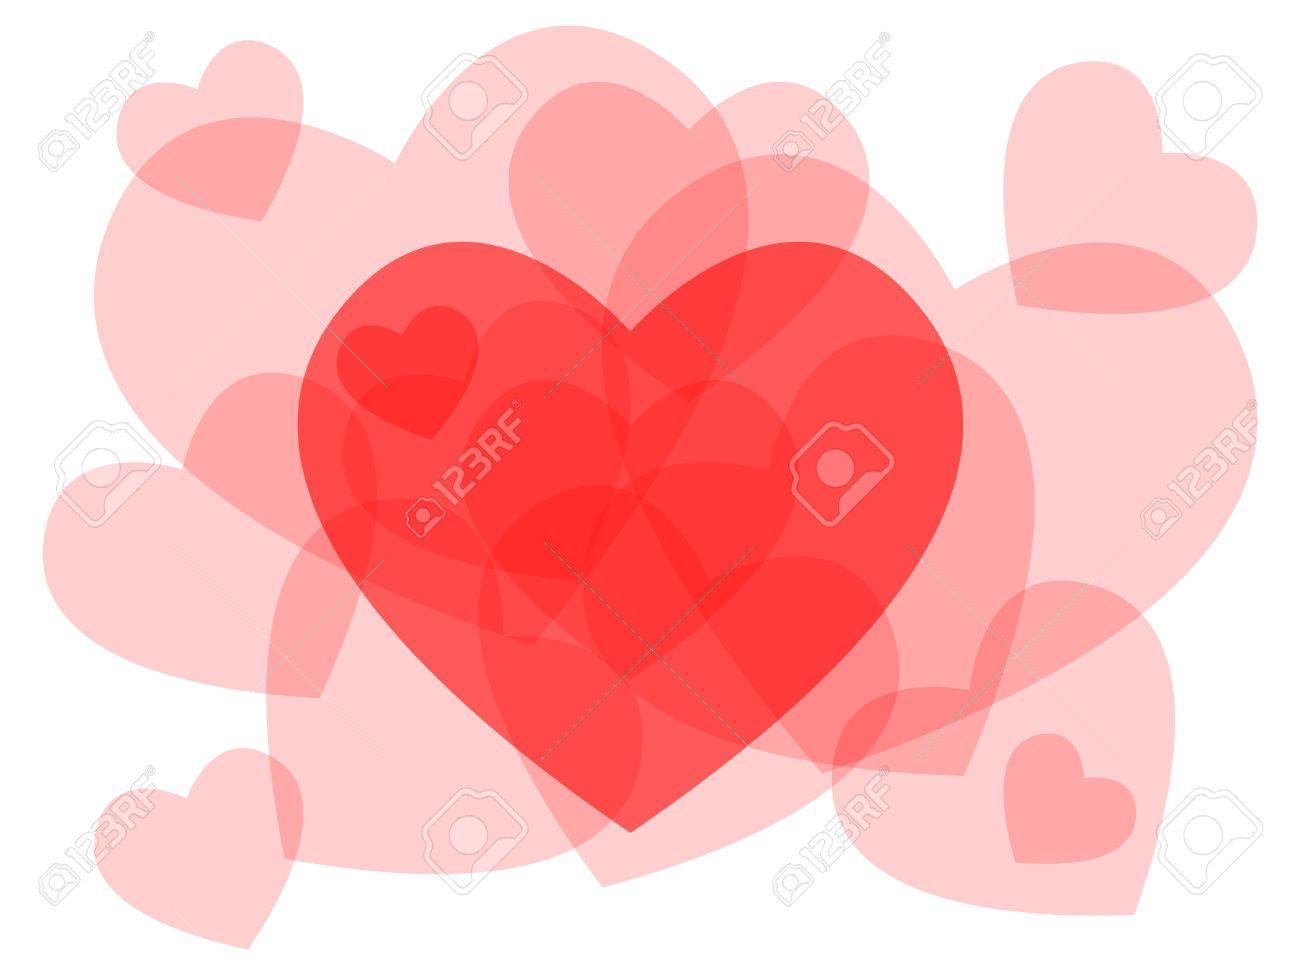 Cute transparent heart symbols overlayed beautiful love or cute transparent heart symbols overlayed beautiful love or valentines day card stock vector biocorpaavc Choice Image